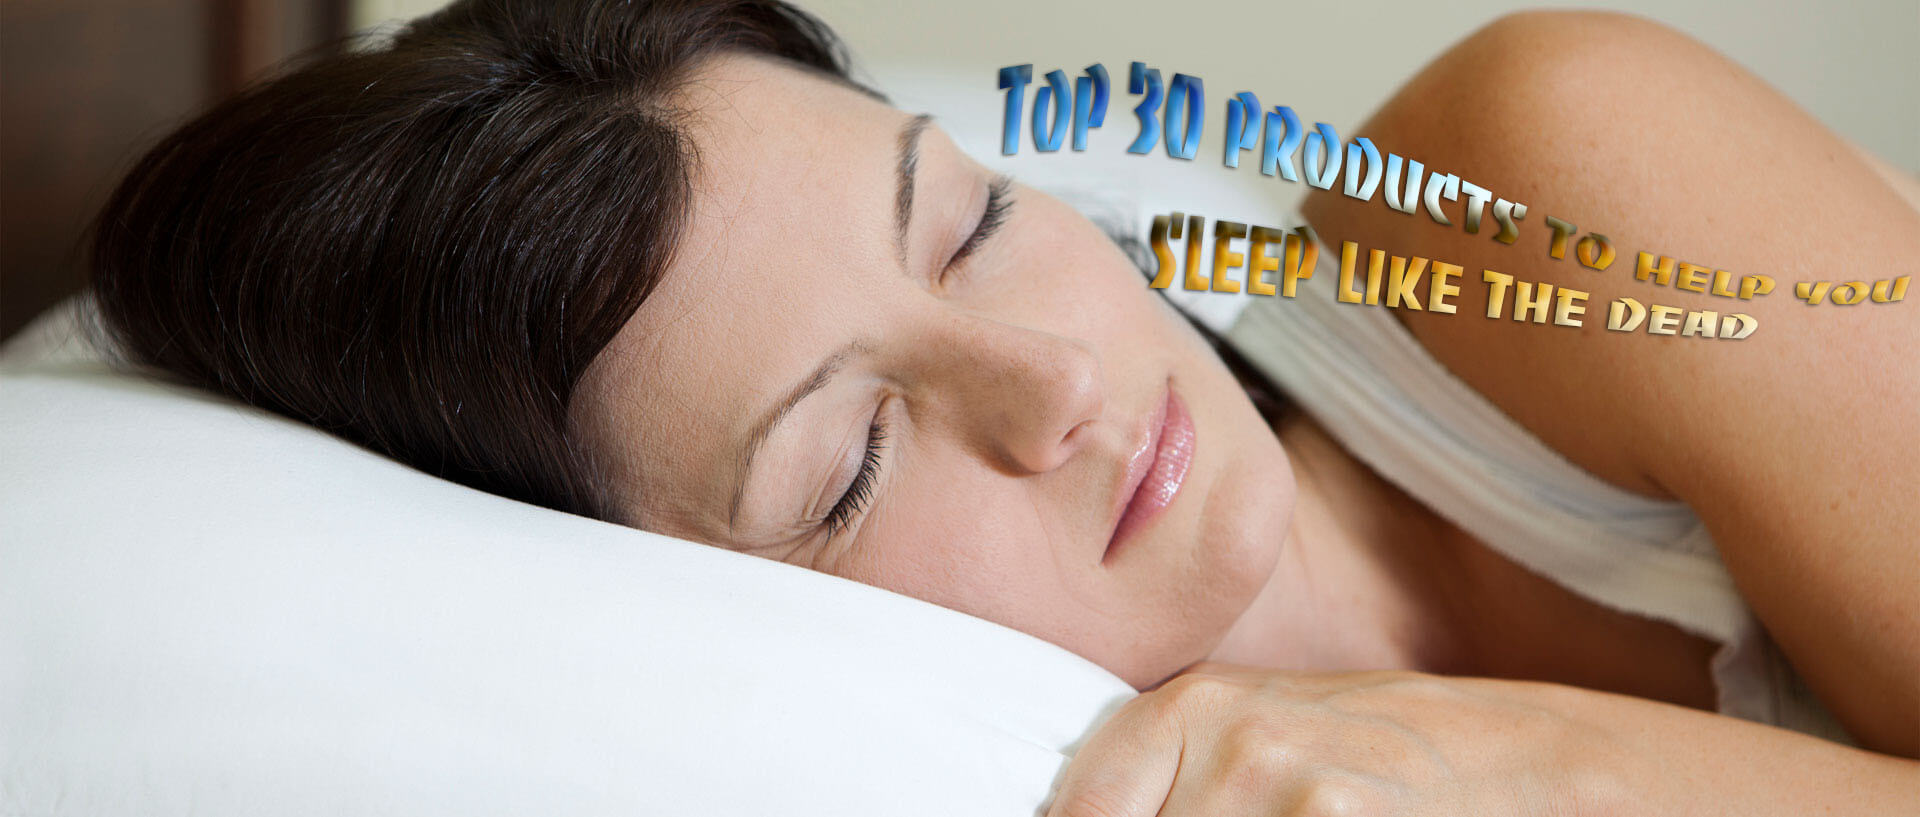 Full Size of Mattresses:voted Best Mattress Best Rated Mattress Amerisleep  Reviews Sleep Like The ...